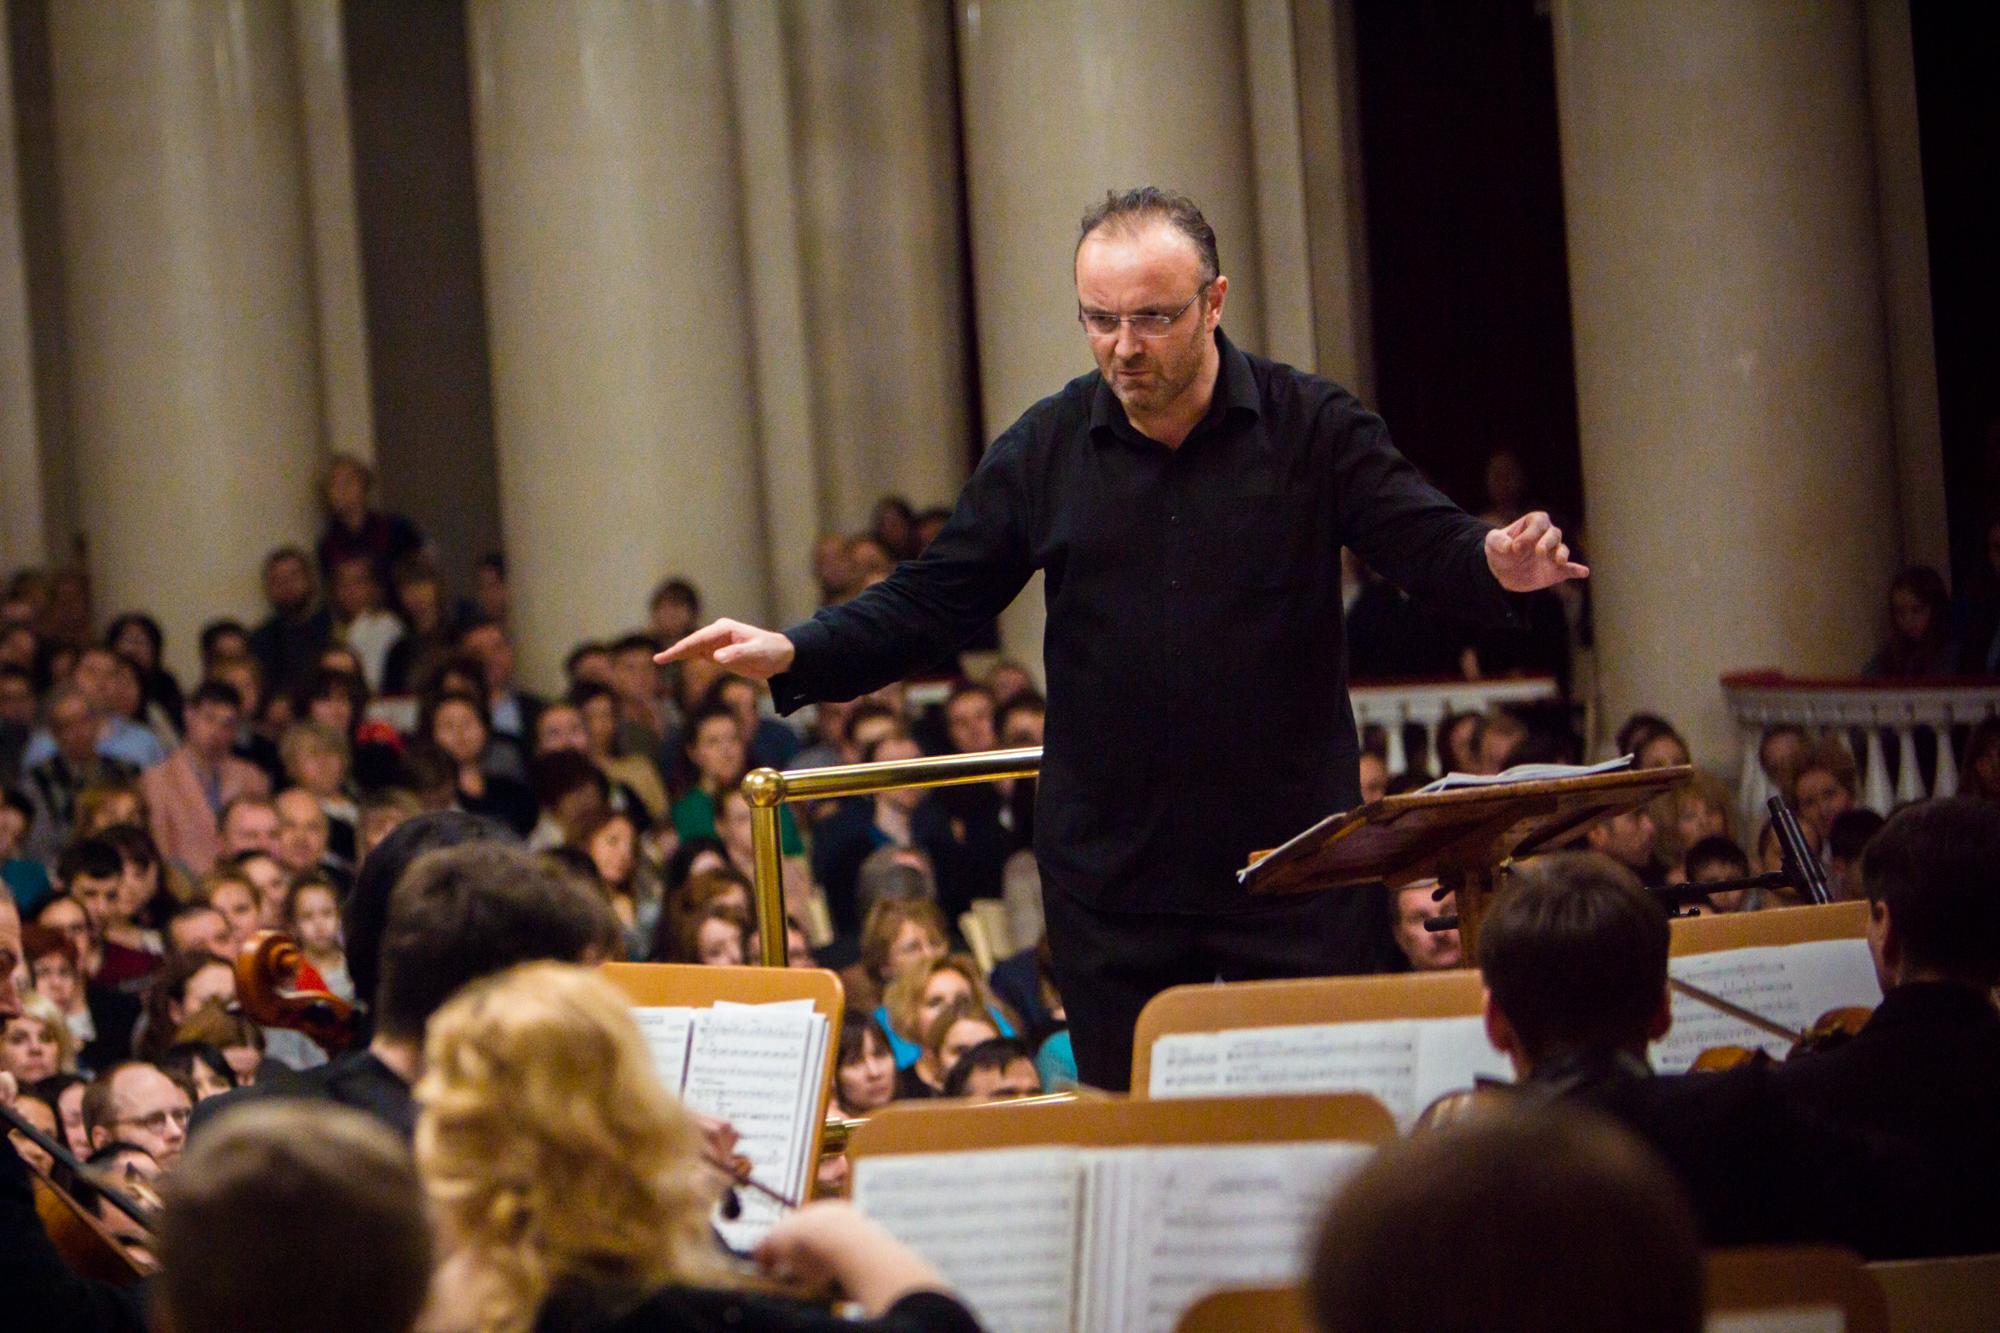 Conductor Anton Gakkel of the St. Petersburg Philharmonic